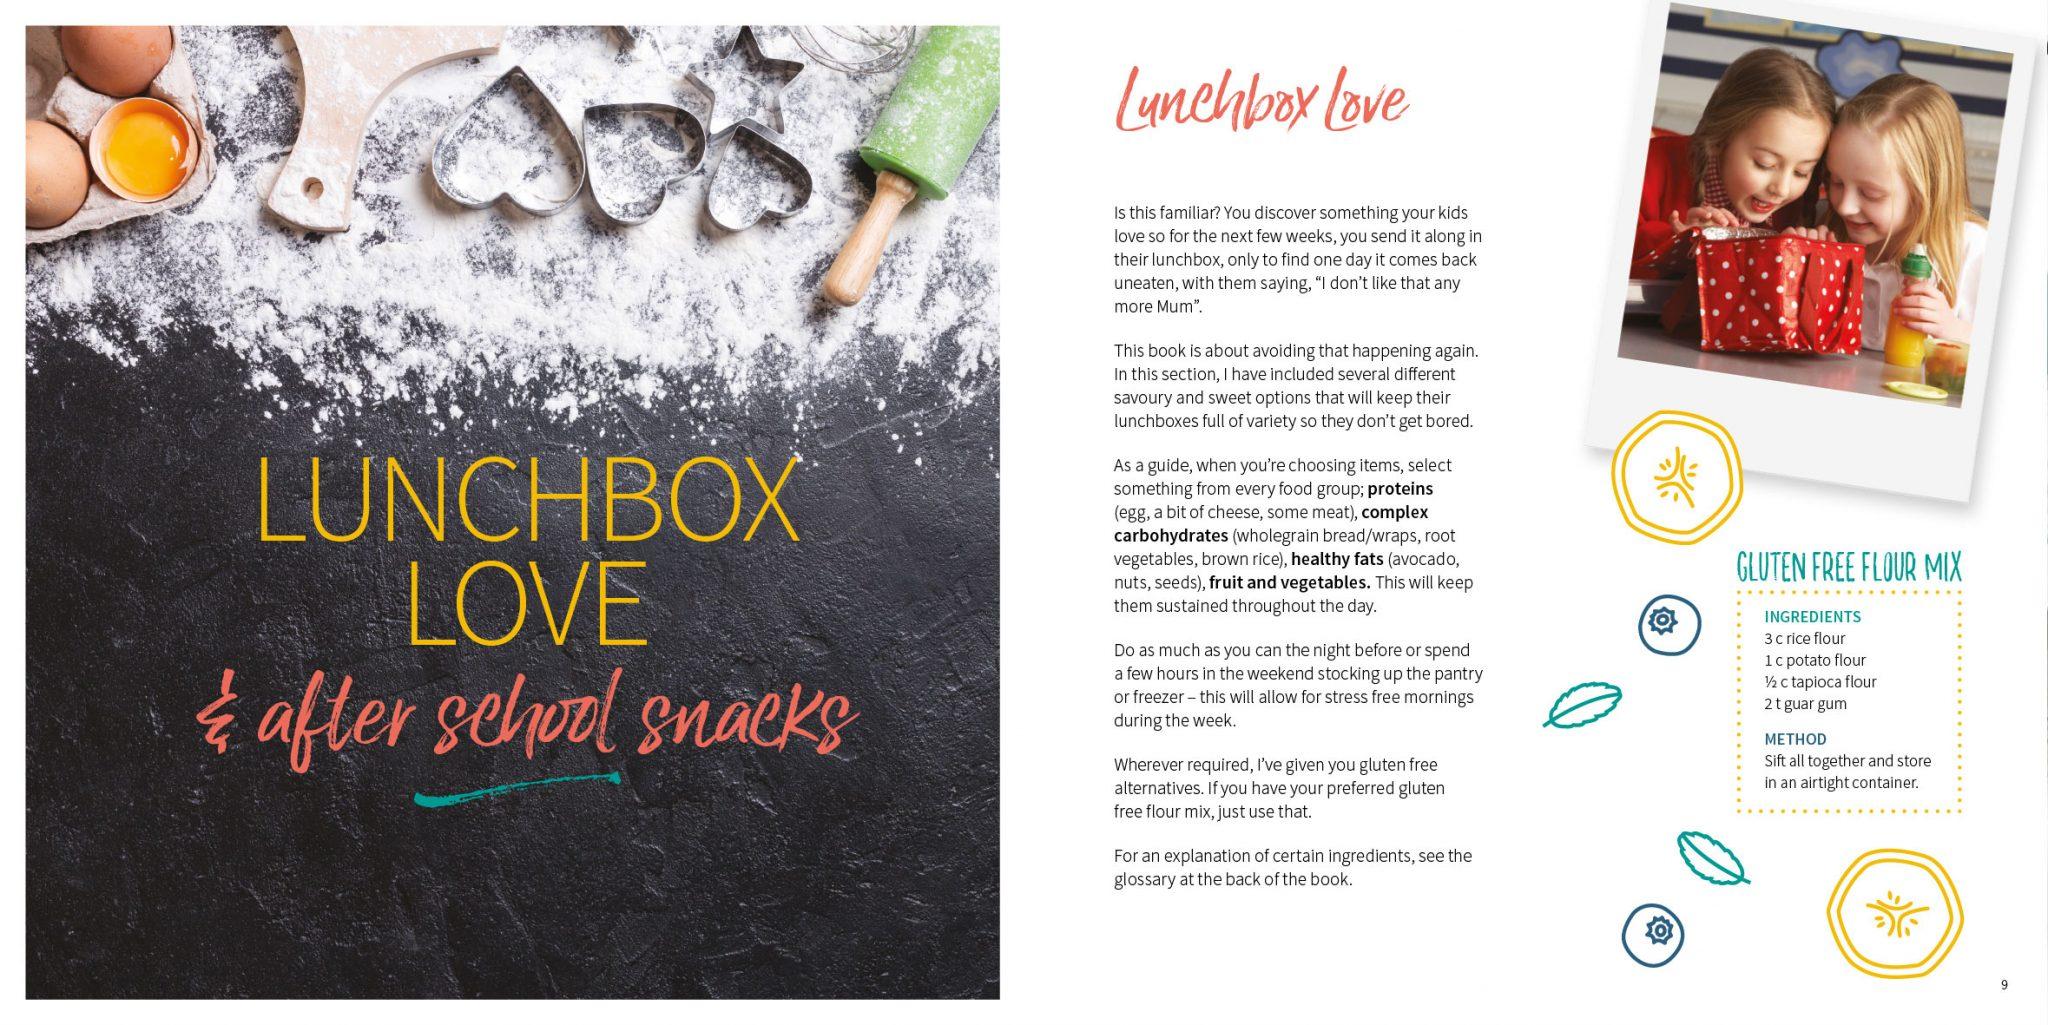 Lunchbox-love